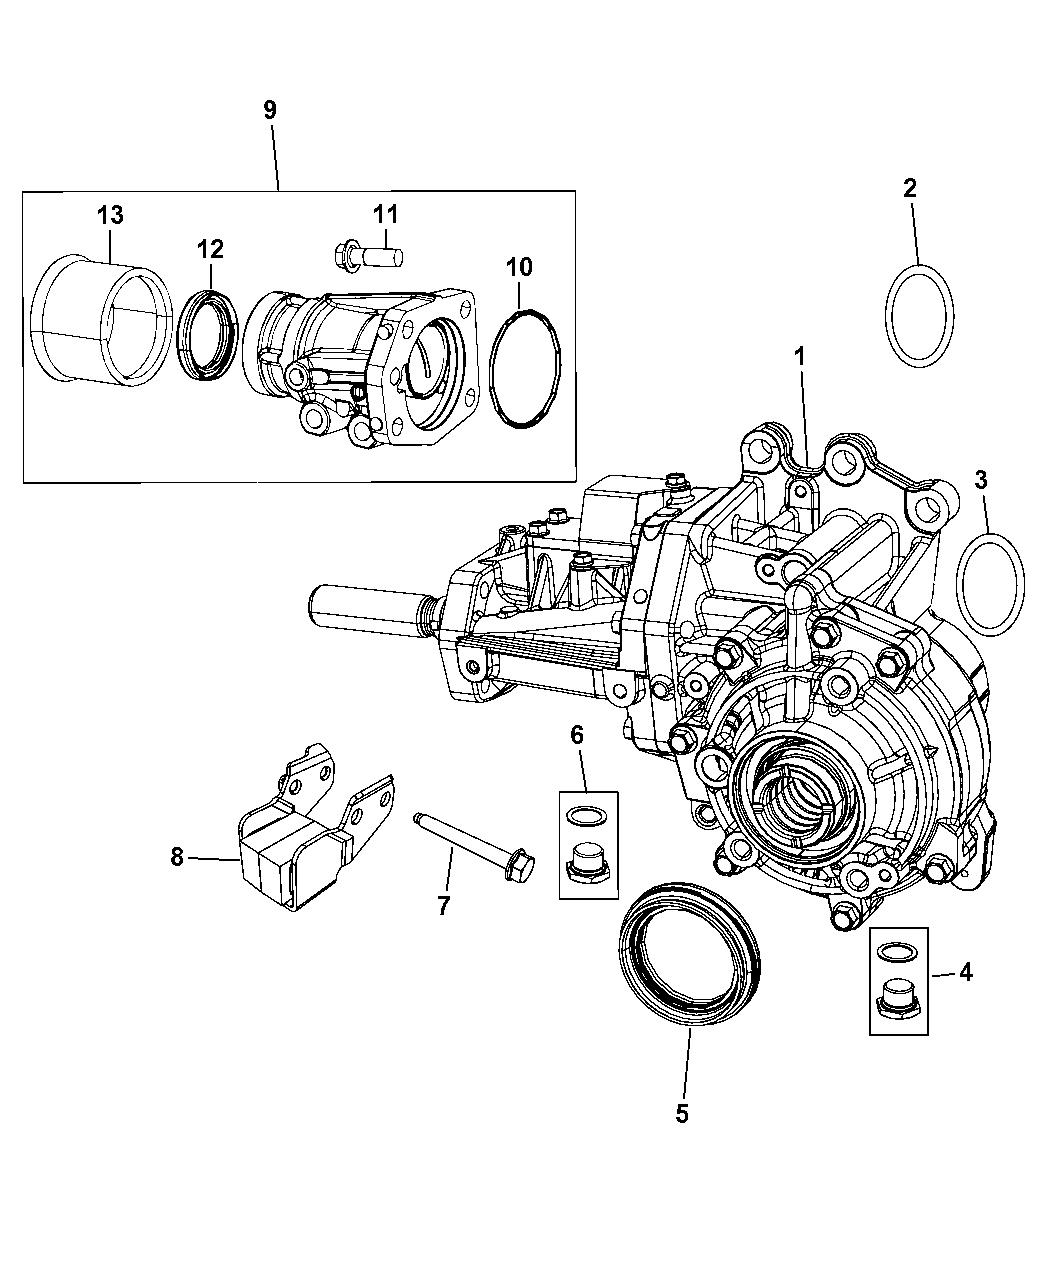 2008 Jeep Patriot 2 0 Engine Diagram Wiring Library Dodge Caliber Power Transfer Unit